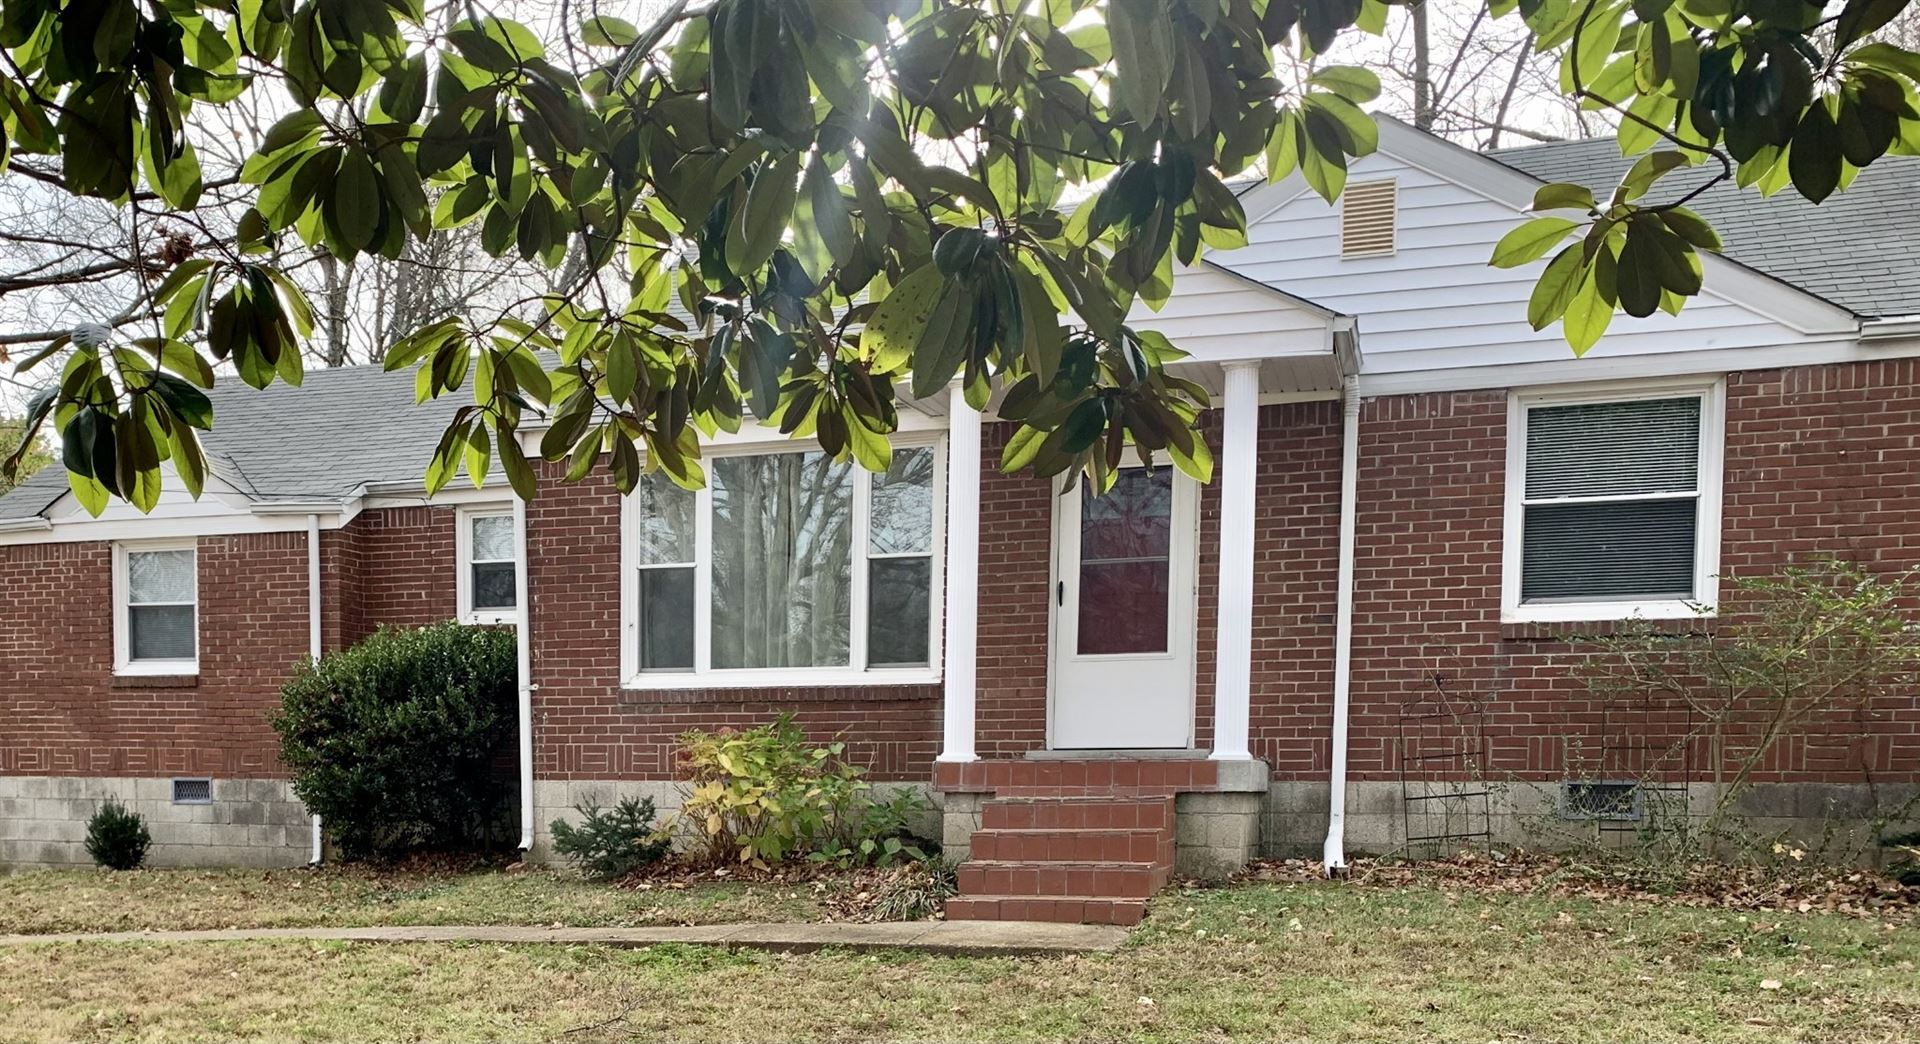 2345 Dennywood Dr, Nashville, TN 37214 - MLS#: 2210310